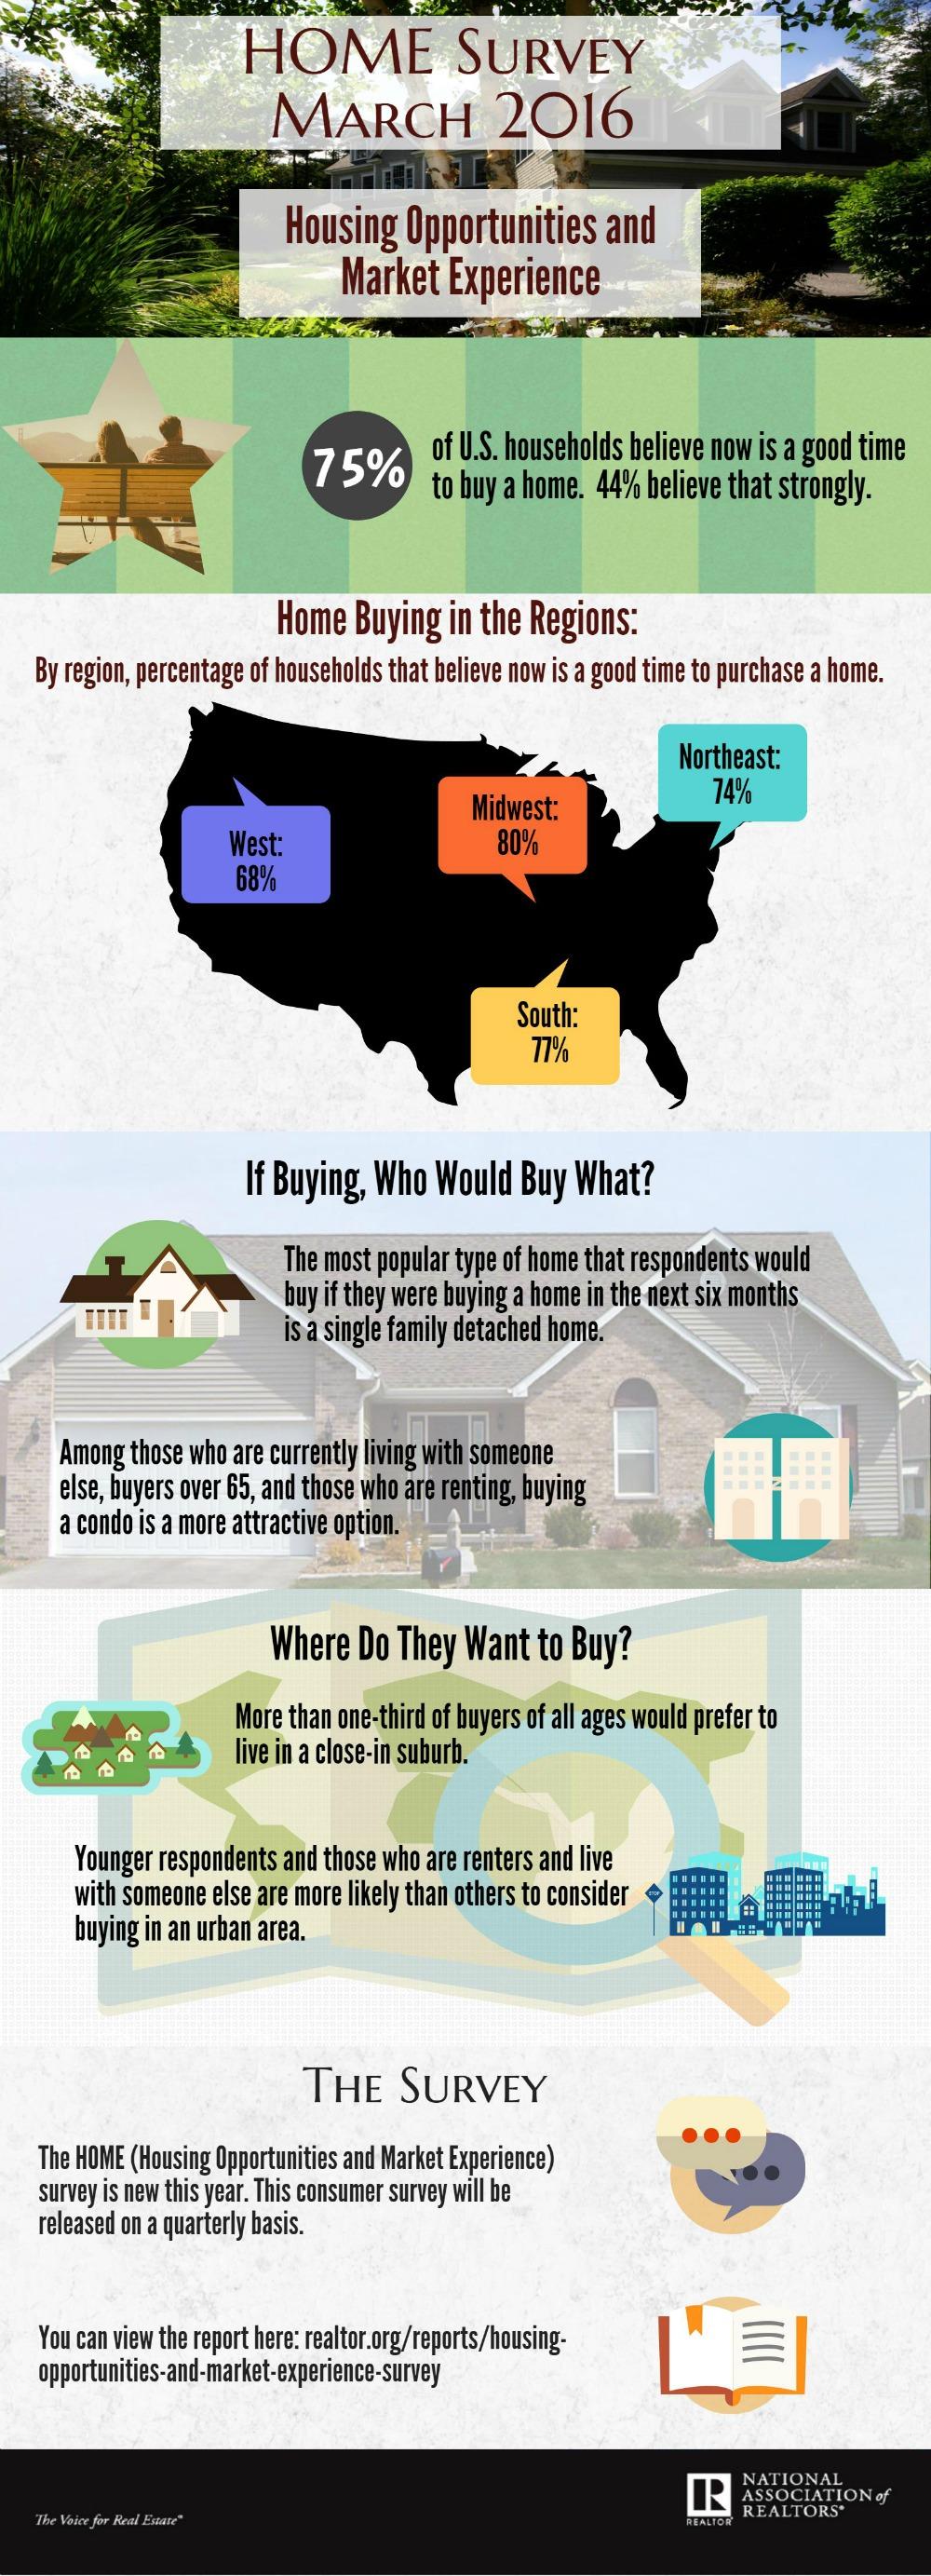 2016 Home Survey